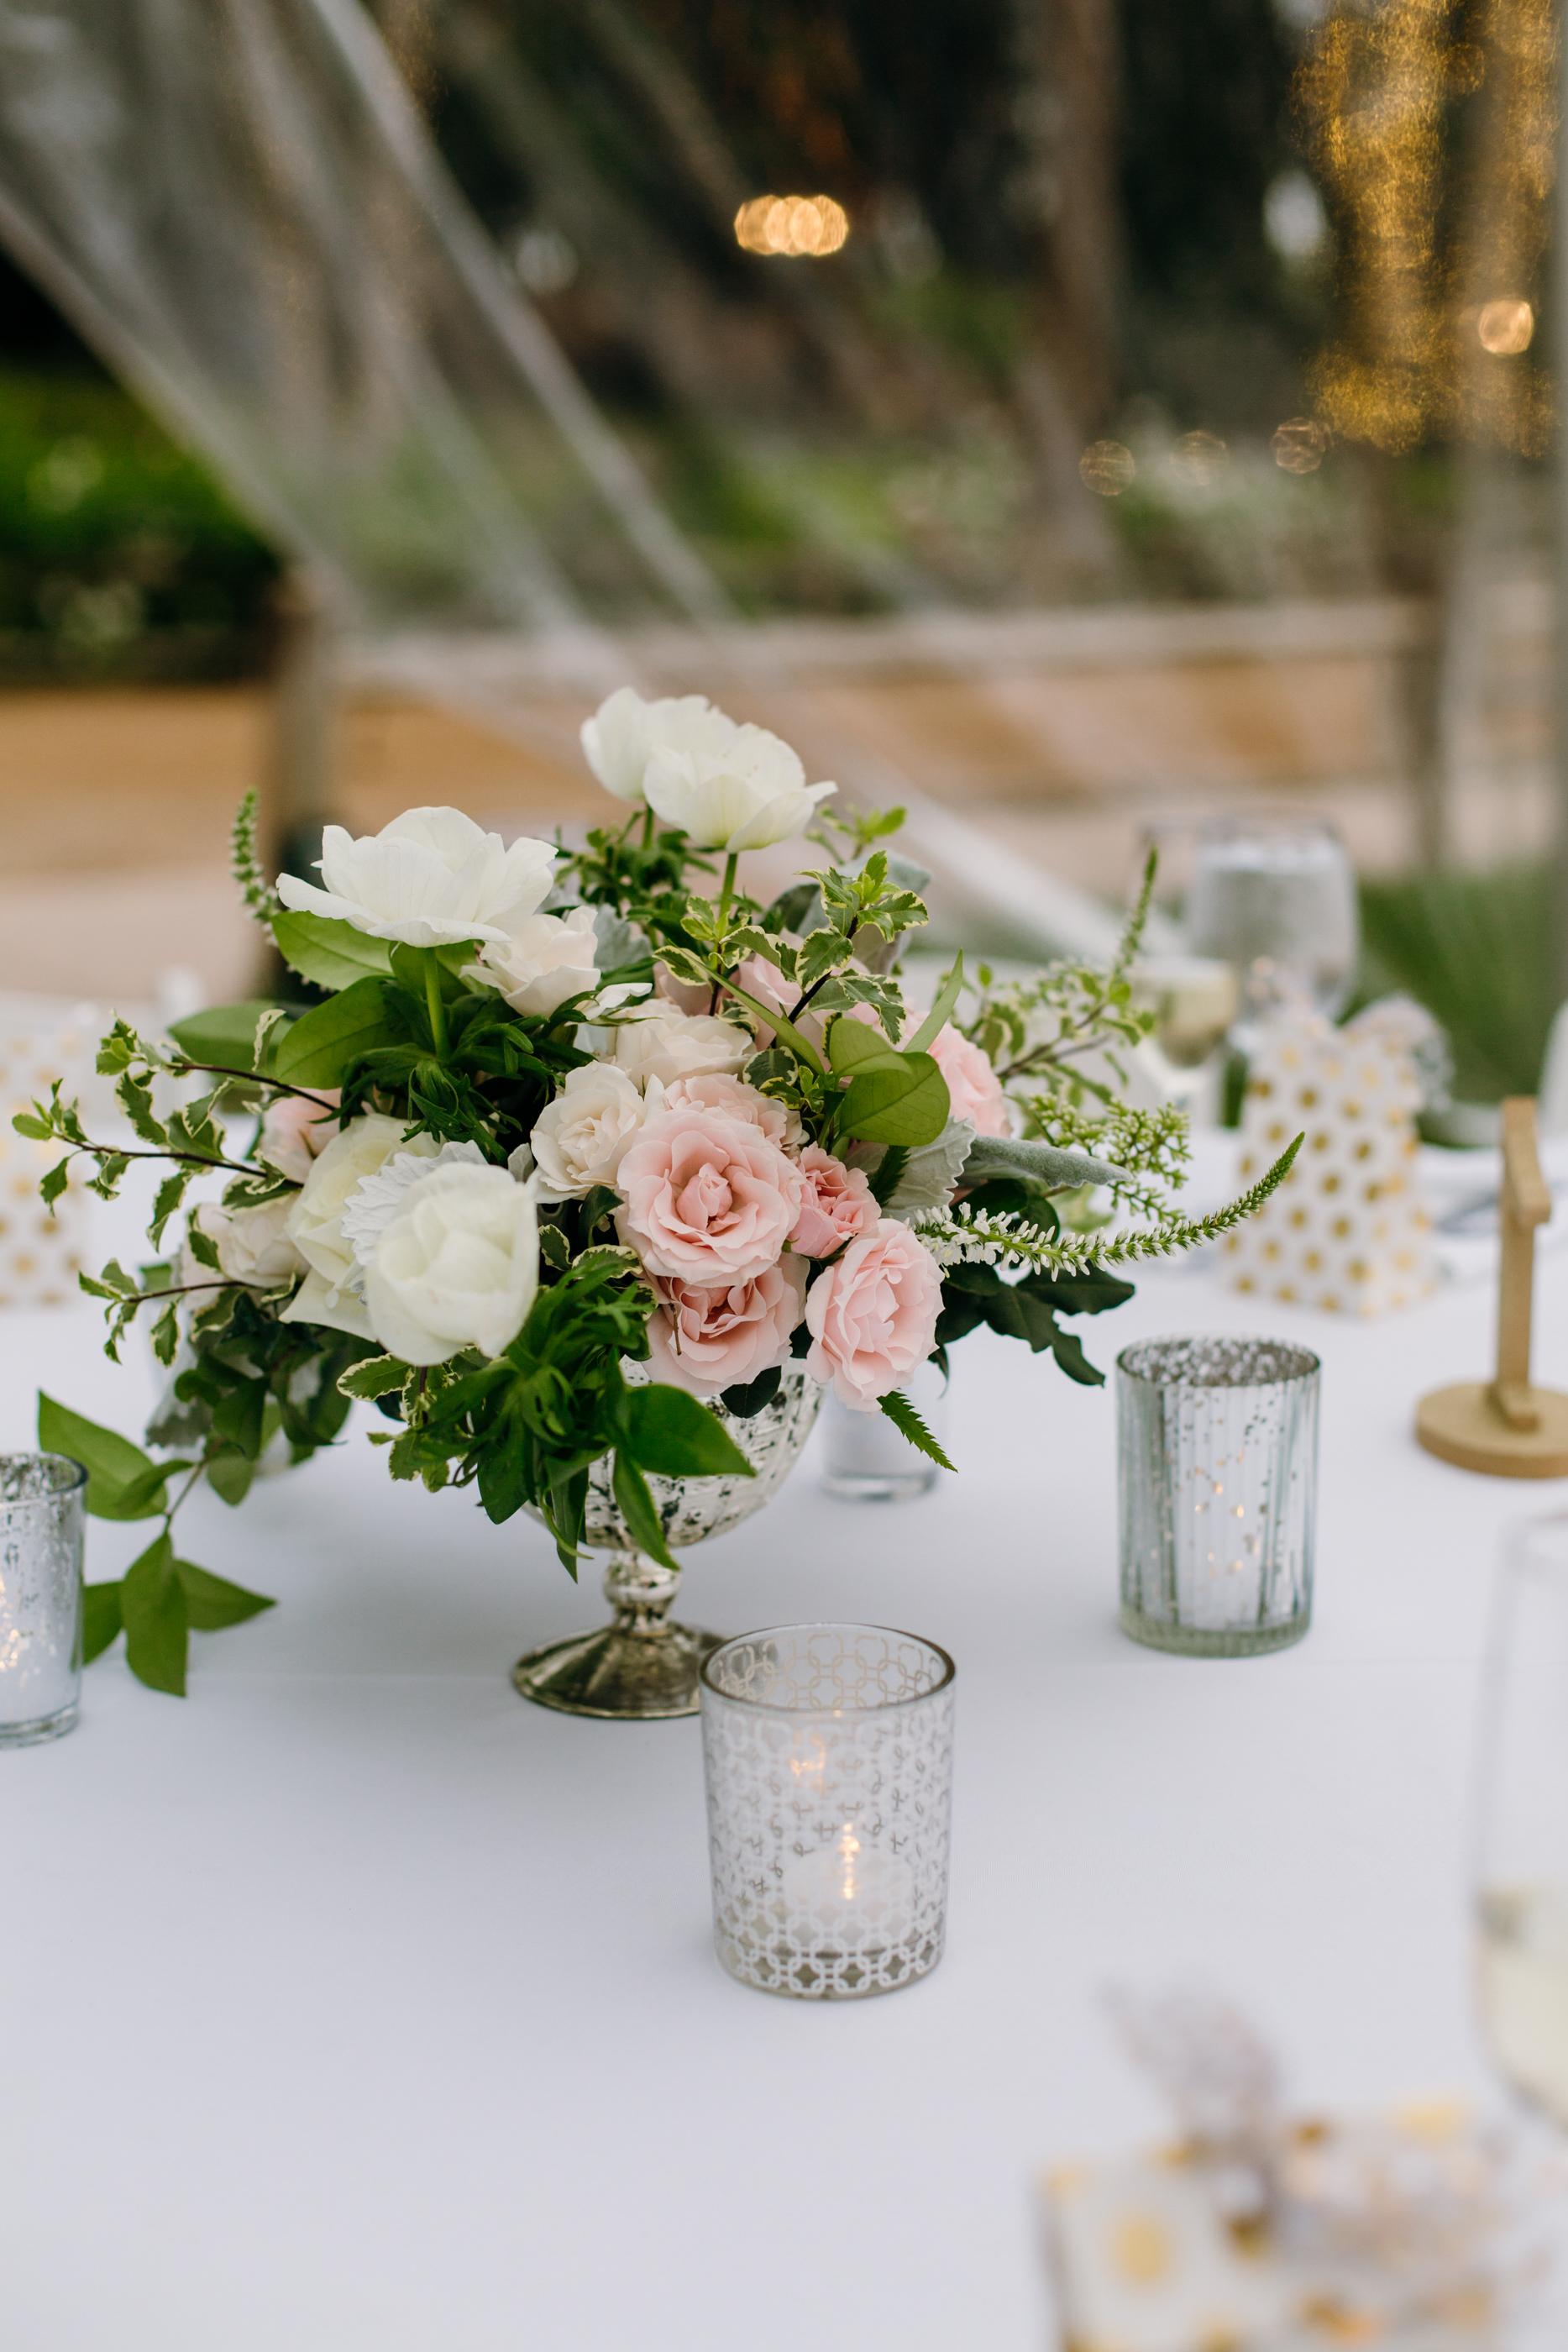 KaraNixonWeddings-LakeOakMeadows-Temecula-Wedding-43.jpg